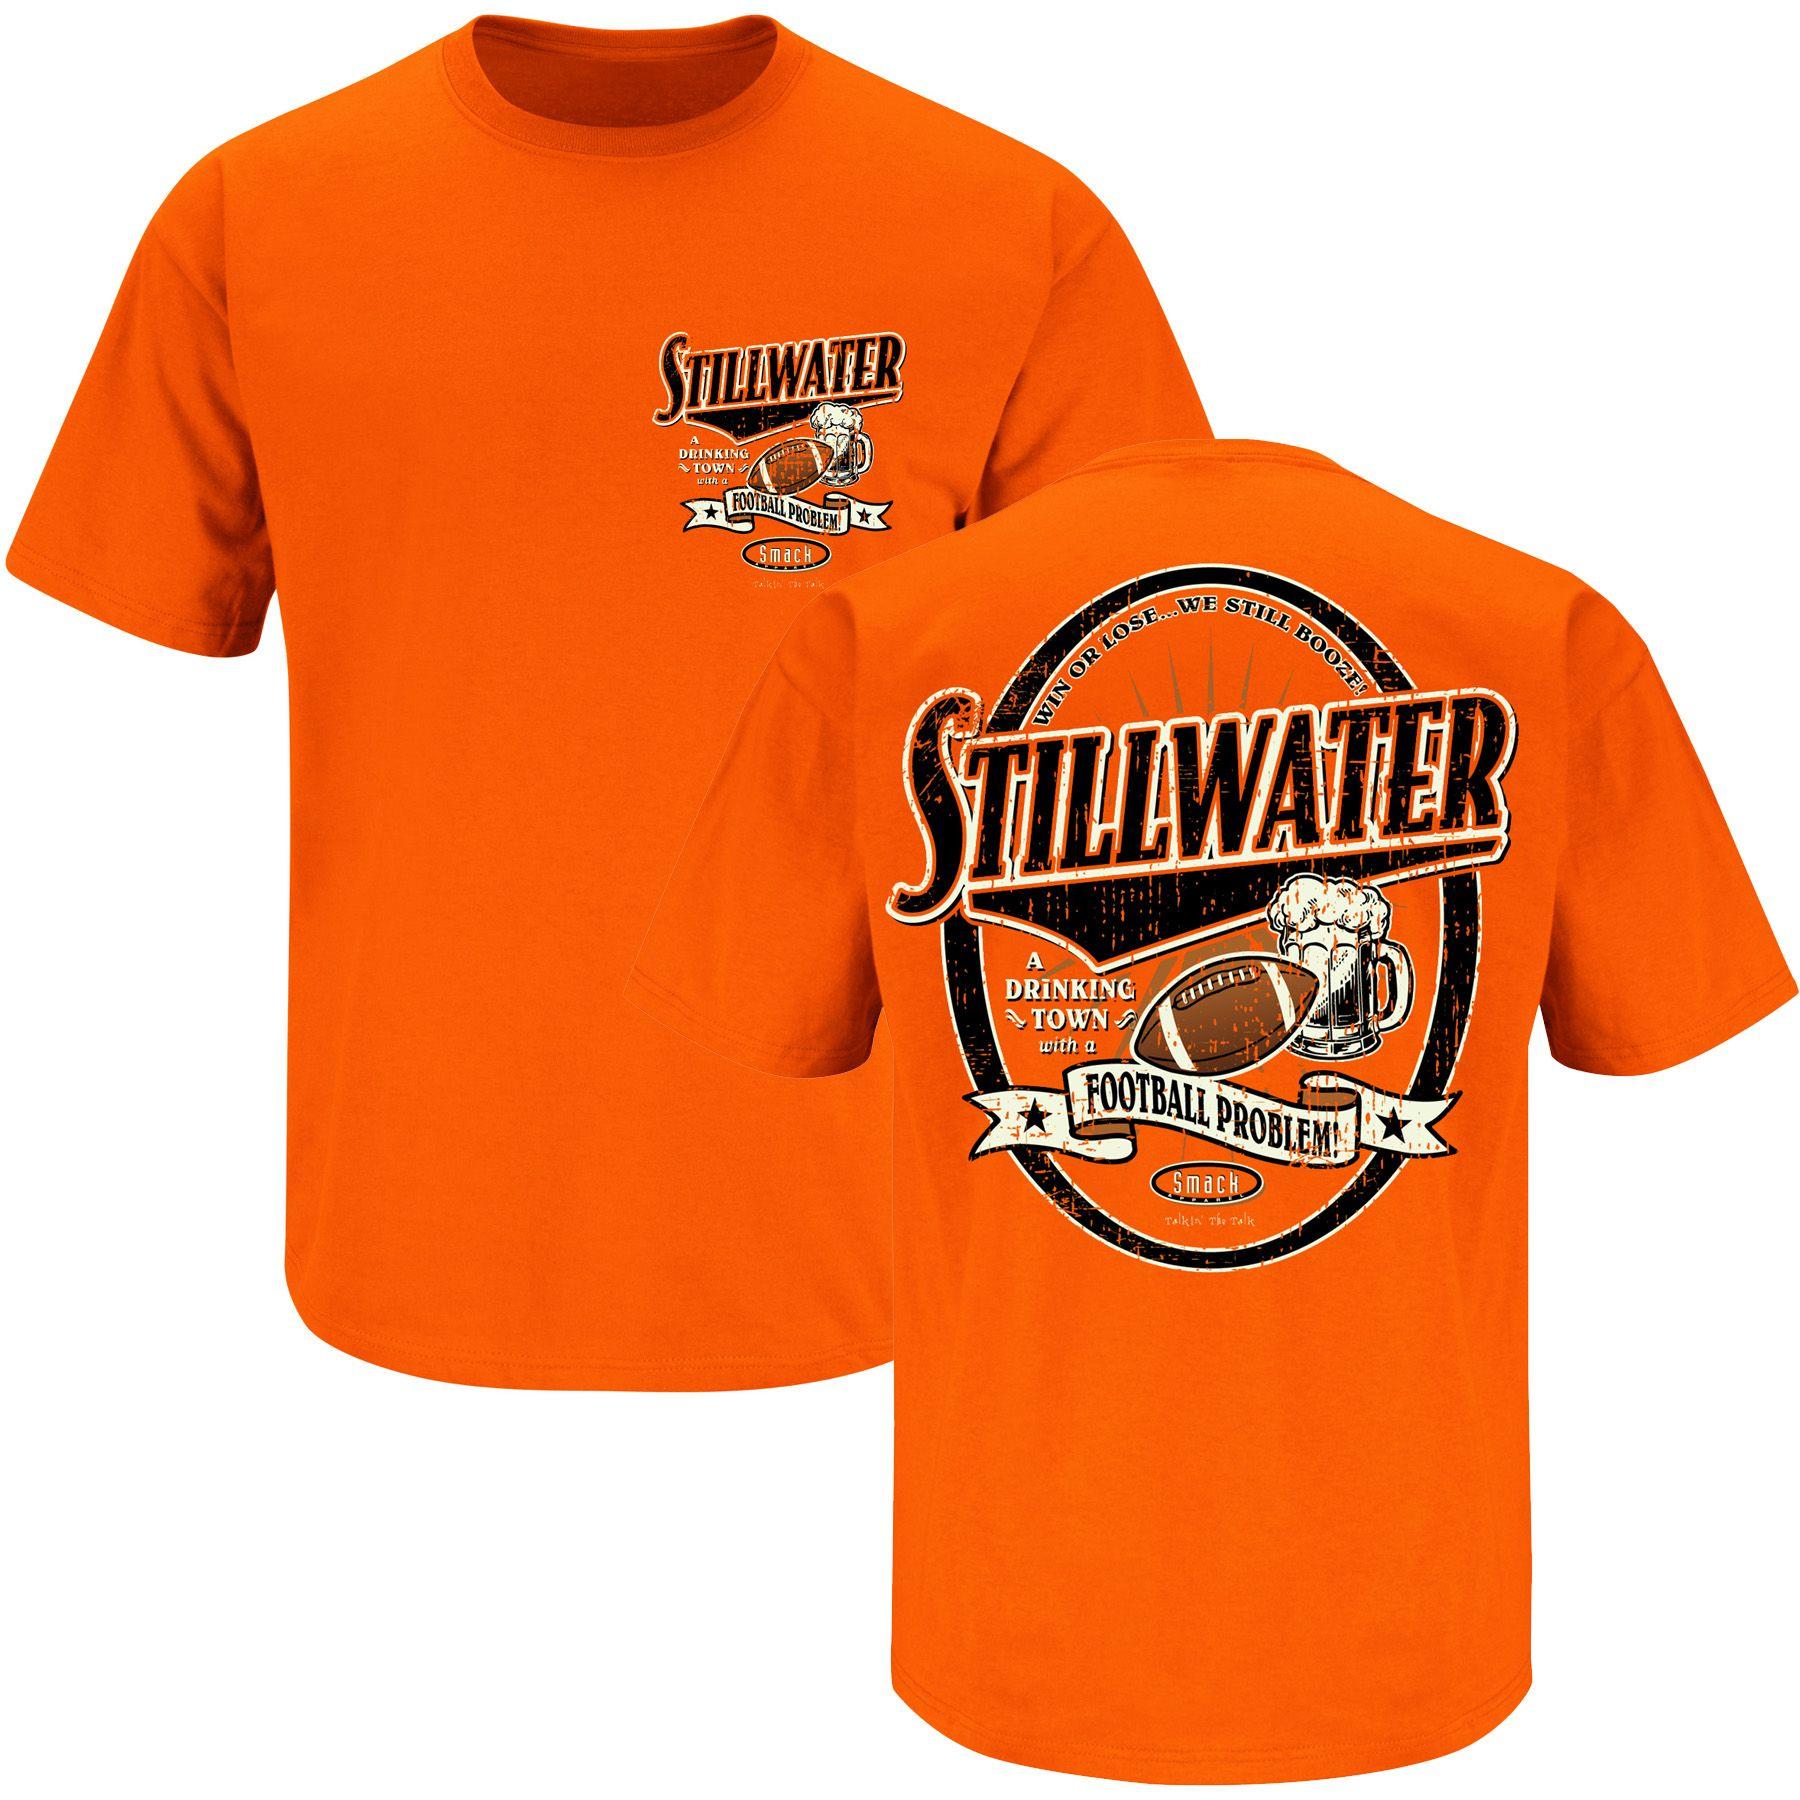 Stillwater Drinking Town Rivals Fanwear Orange t shirts